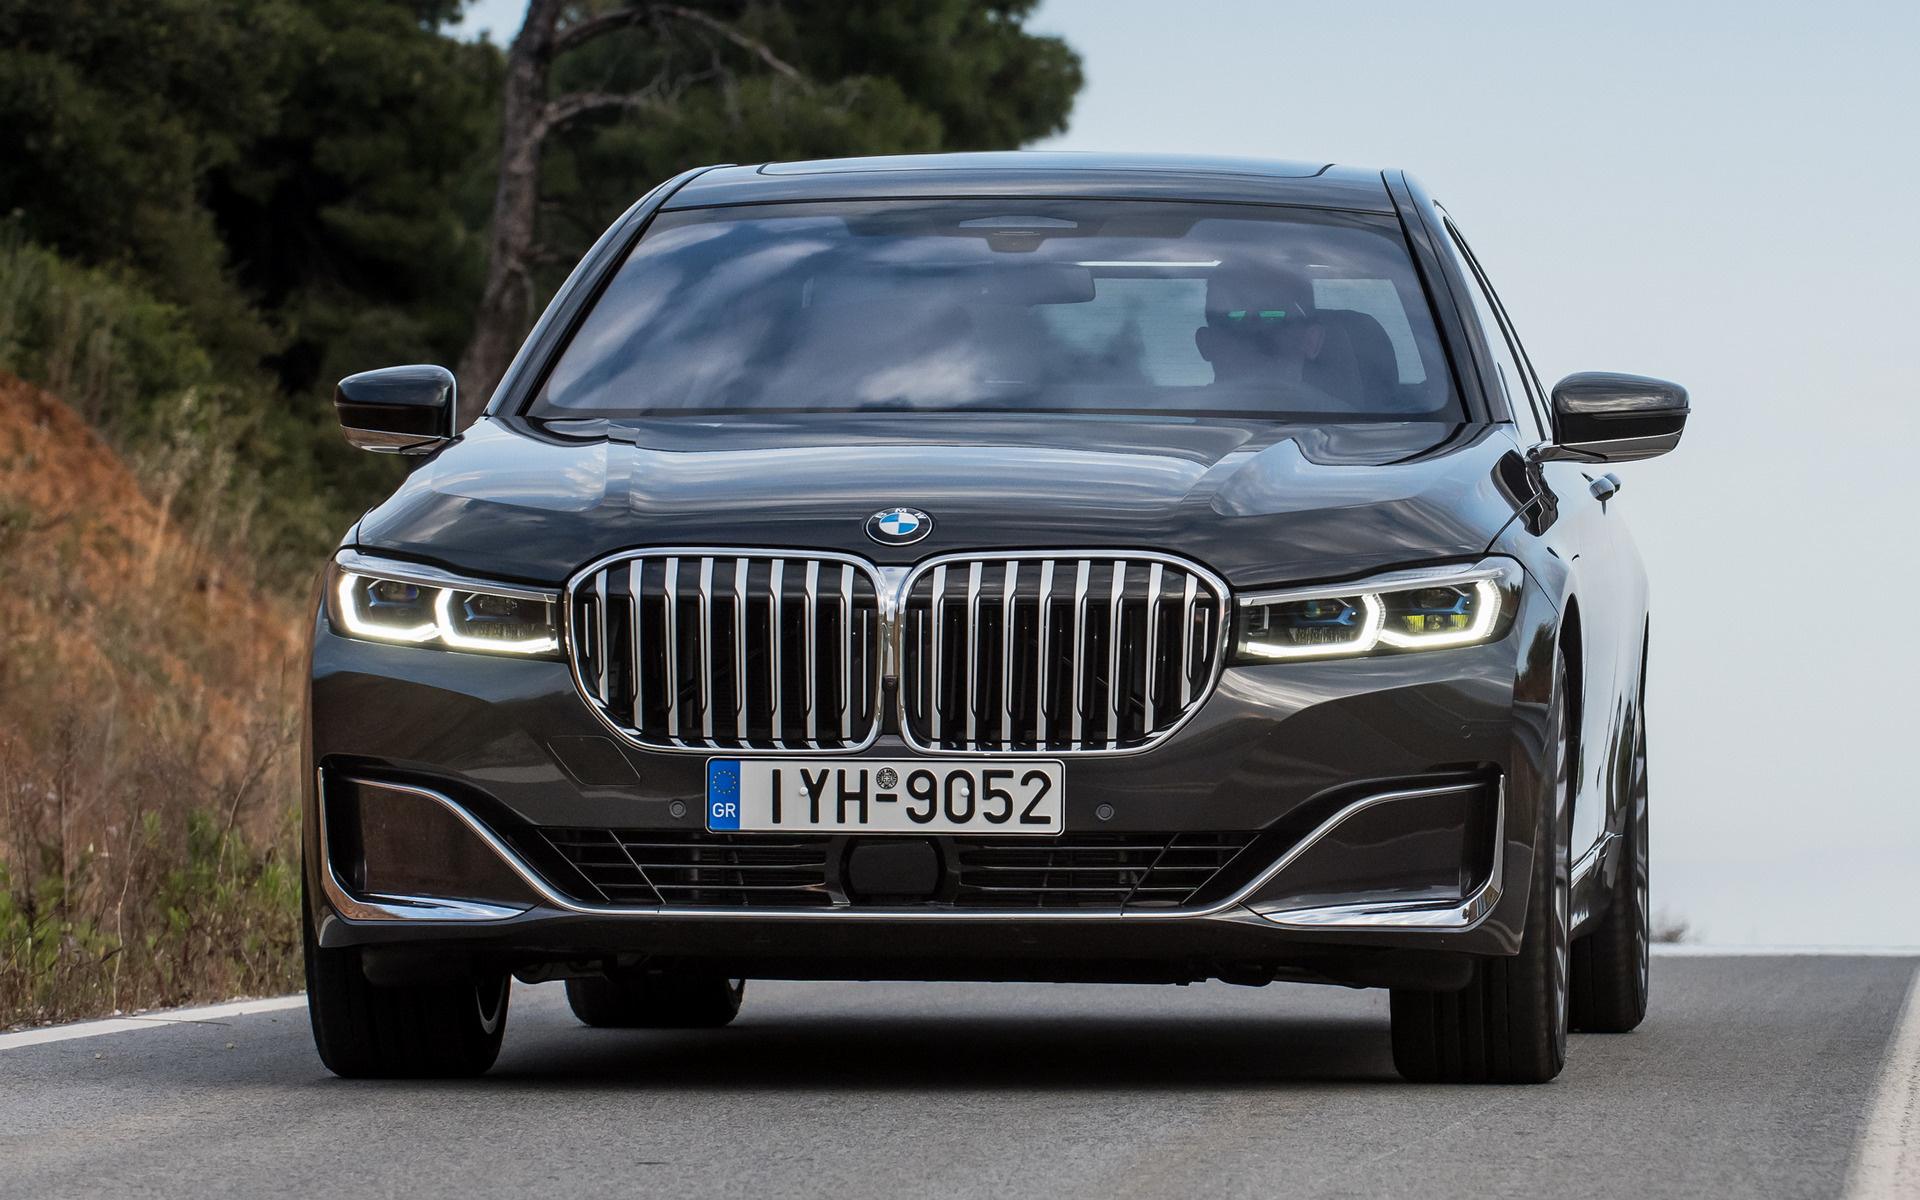 2019 BMW 7 Series Plug-In Hybrid LWB - Wallpapers and HD ...